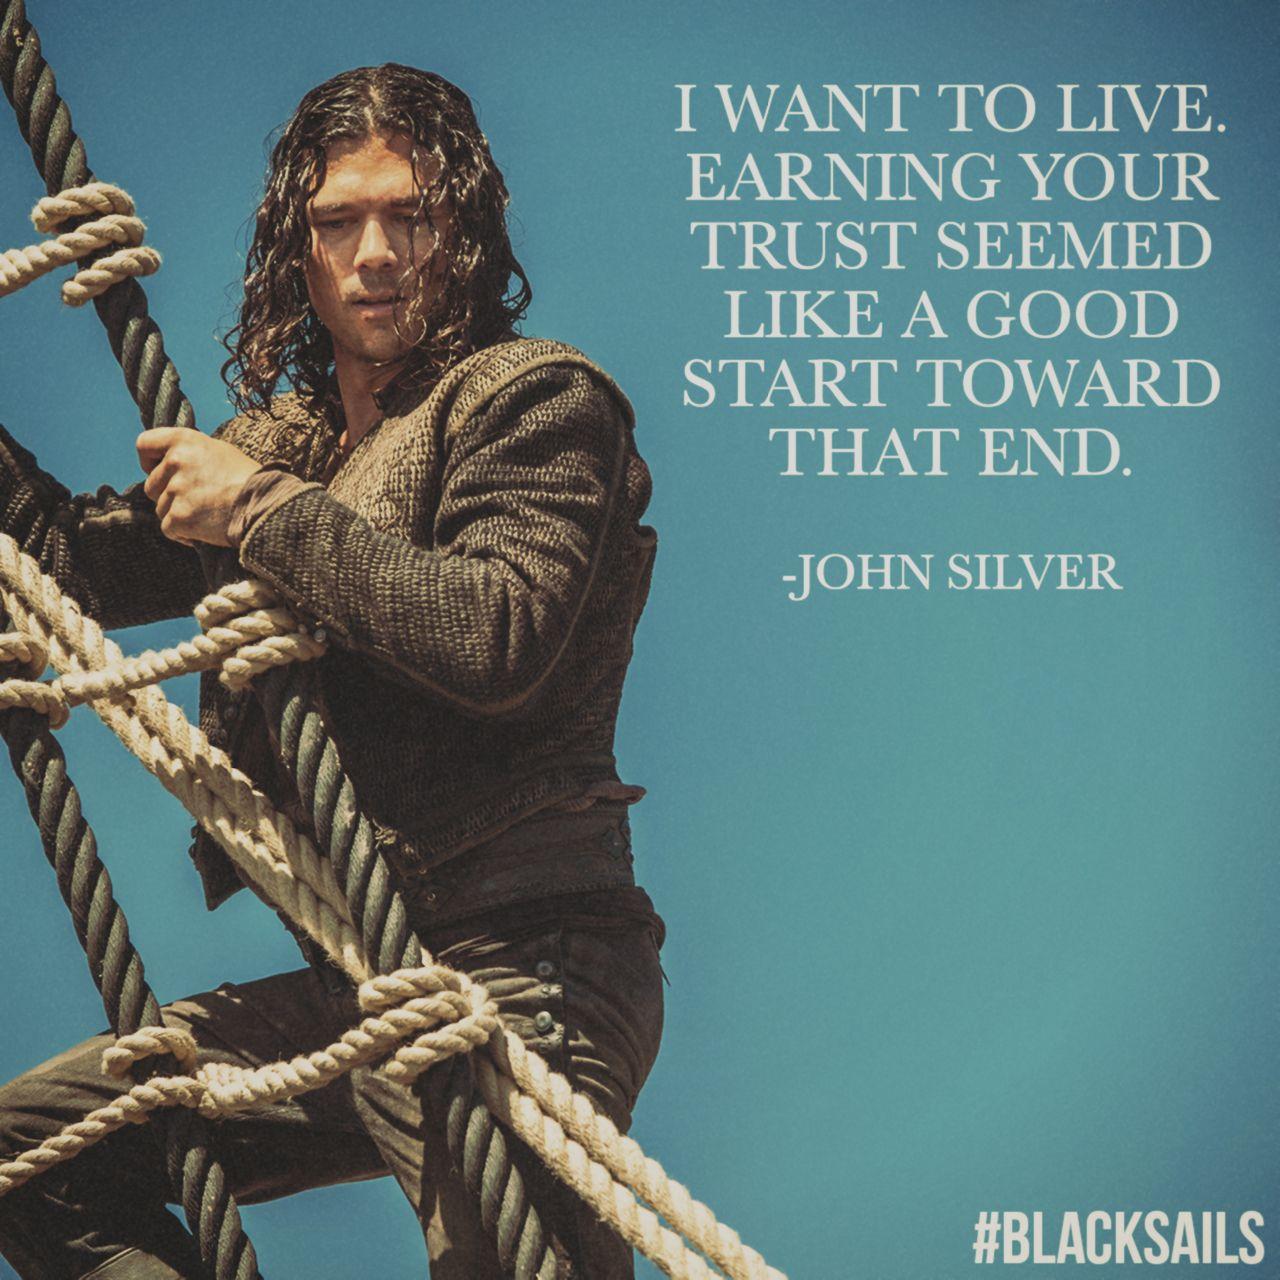 121 Best Black Sails images | Black sails, Charles vane, Pirate life